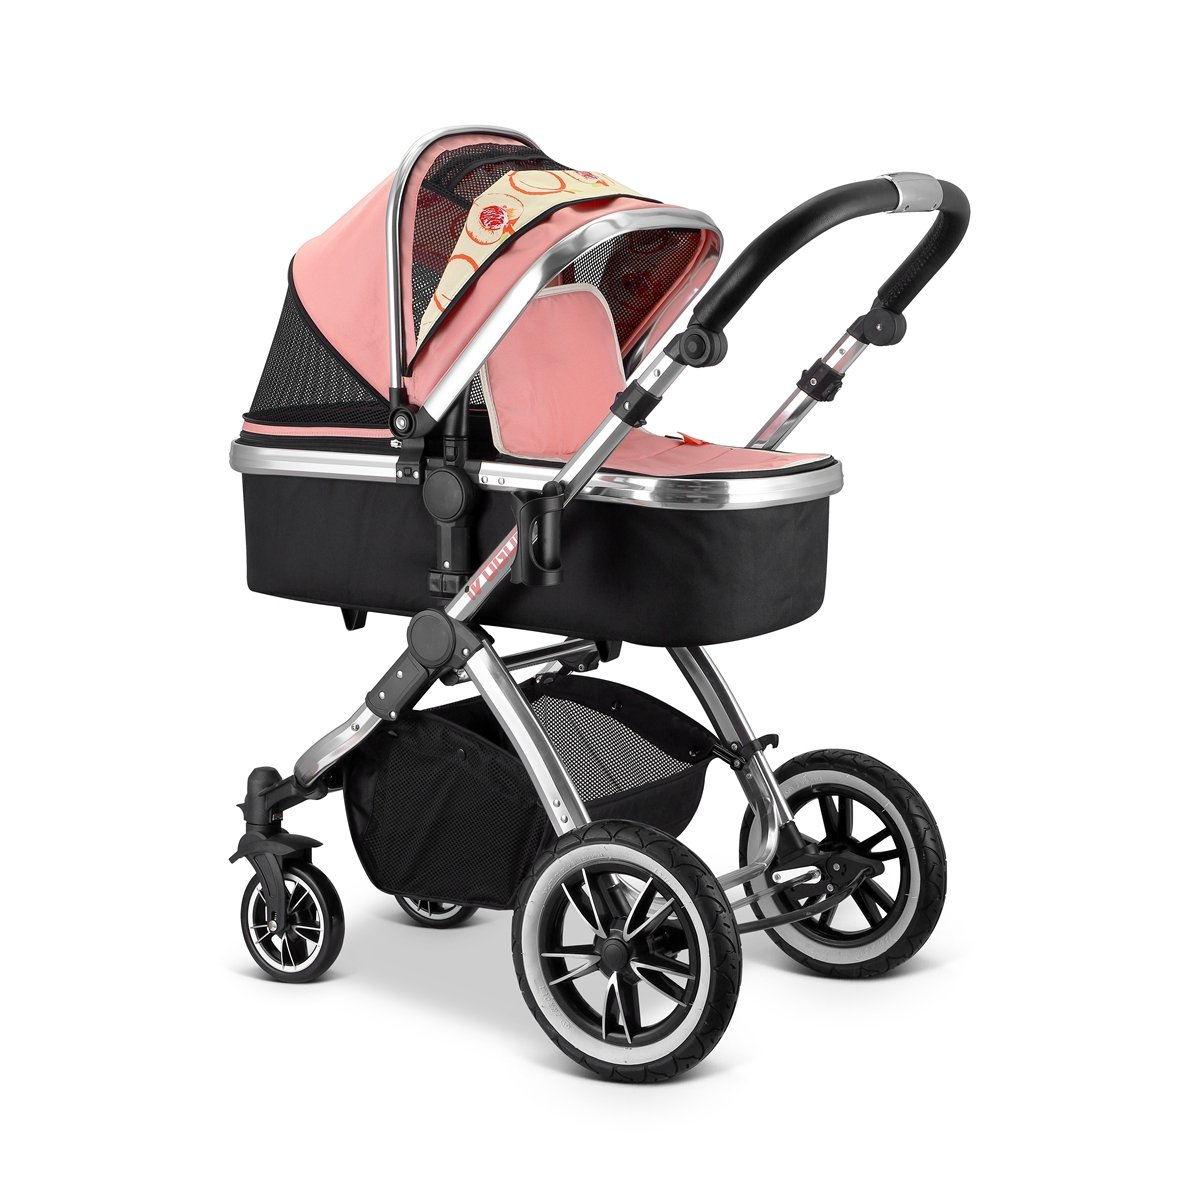 iVogue Peach Luxury 3in1 Pram Stroller Travel System Carseat+ISOFIX Base